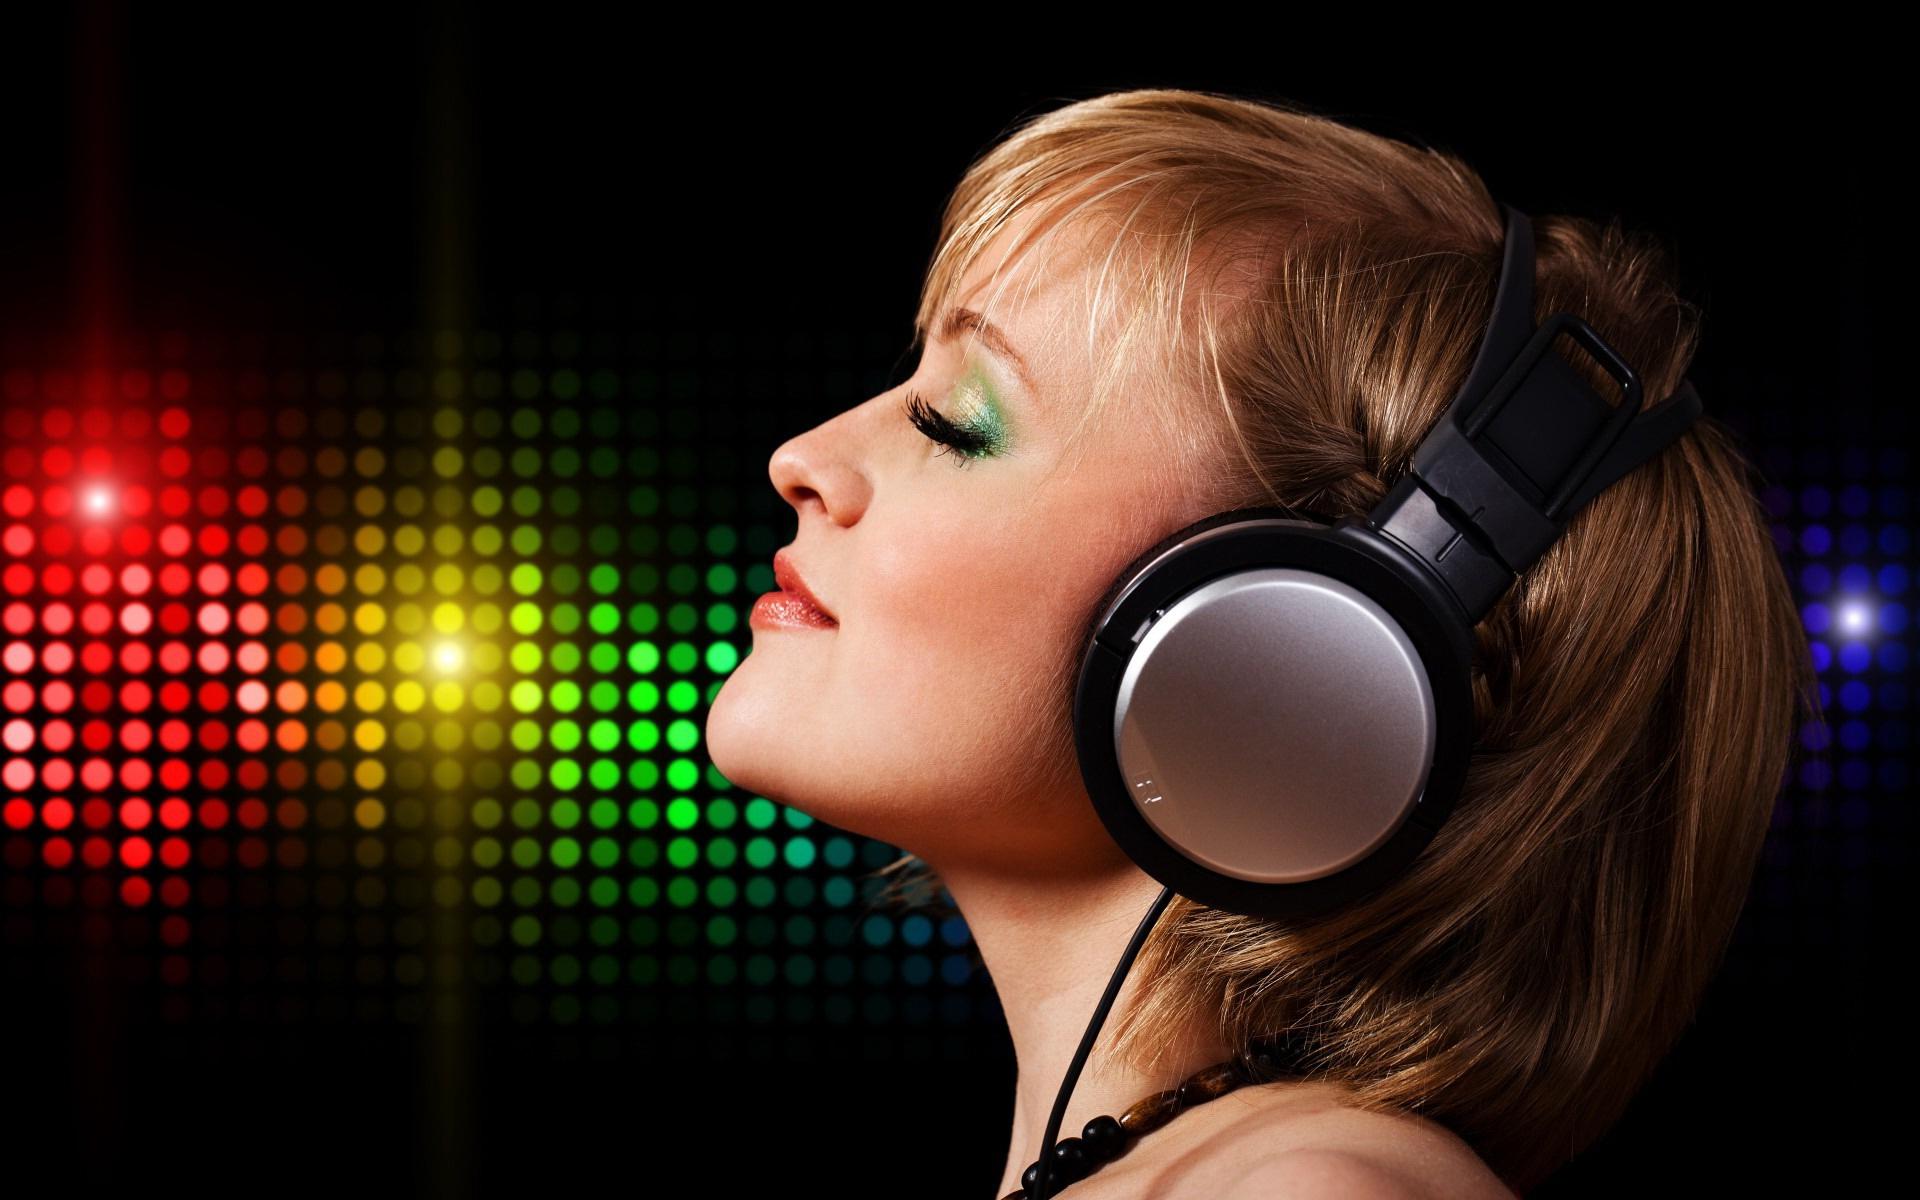 Description: Music Girl Wallpaper HD is a hi res Wallpaper for pc